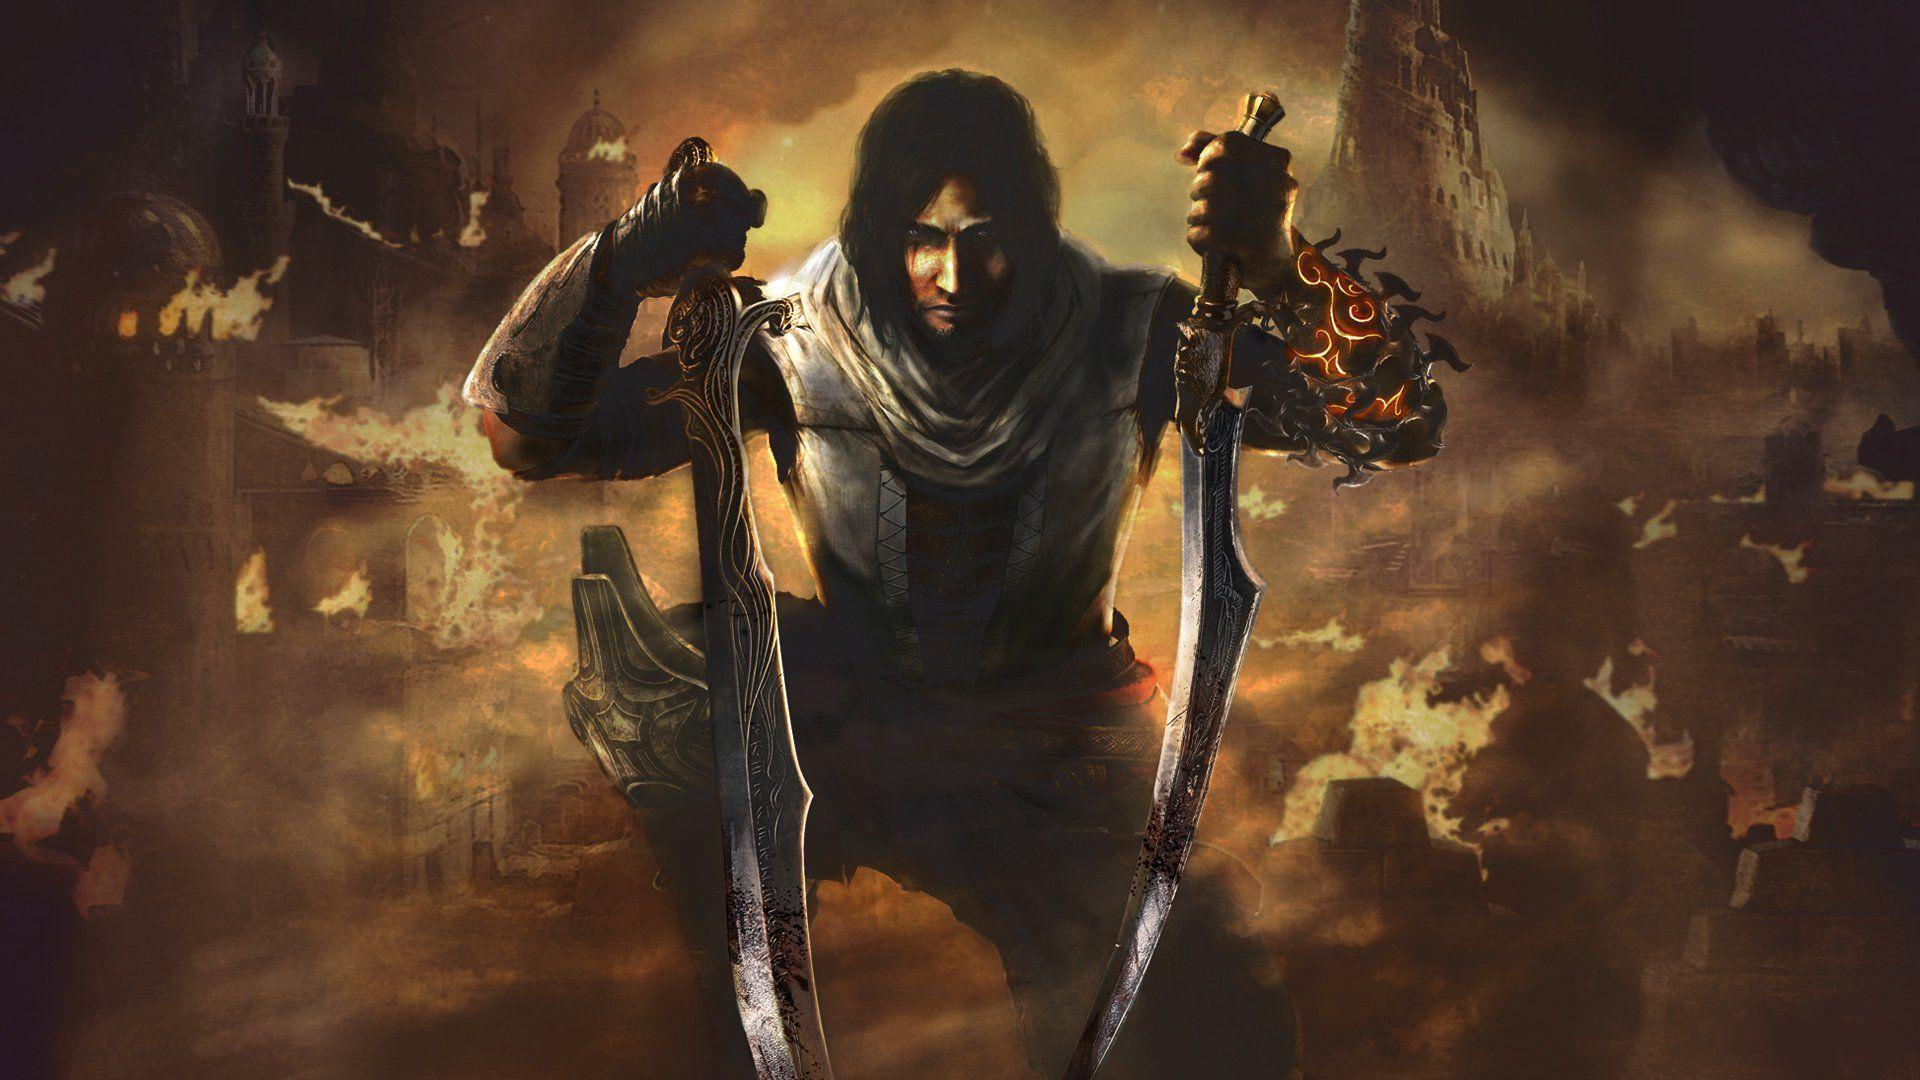 картинки на явку из фильма принц персии